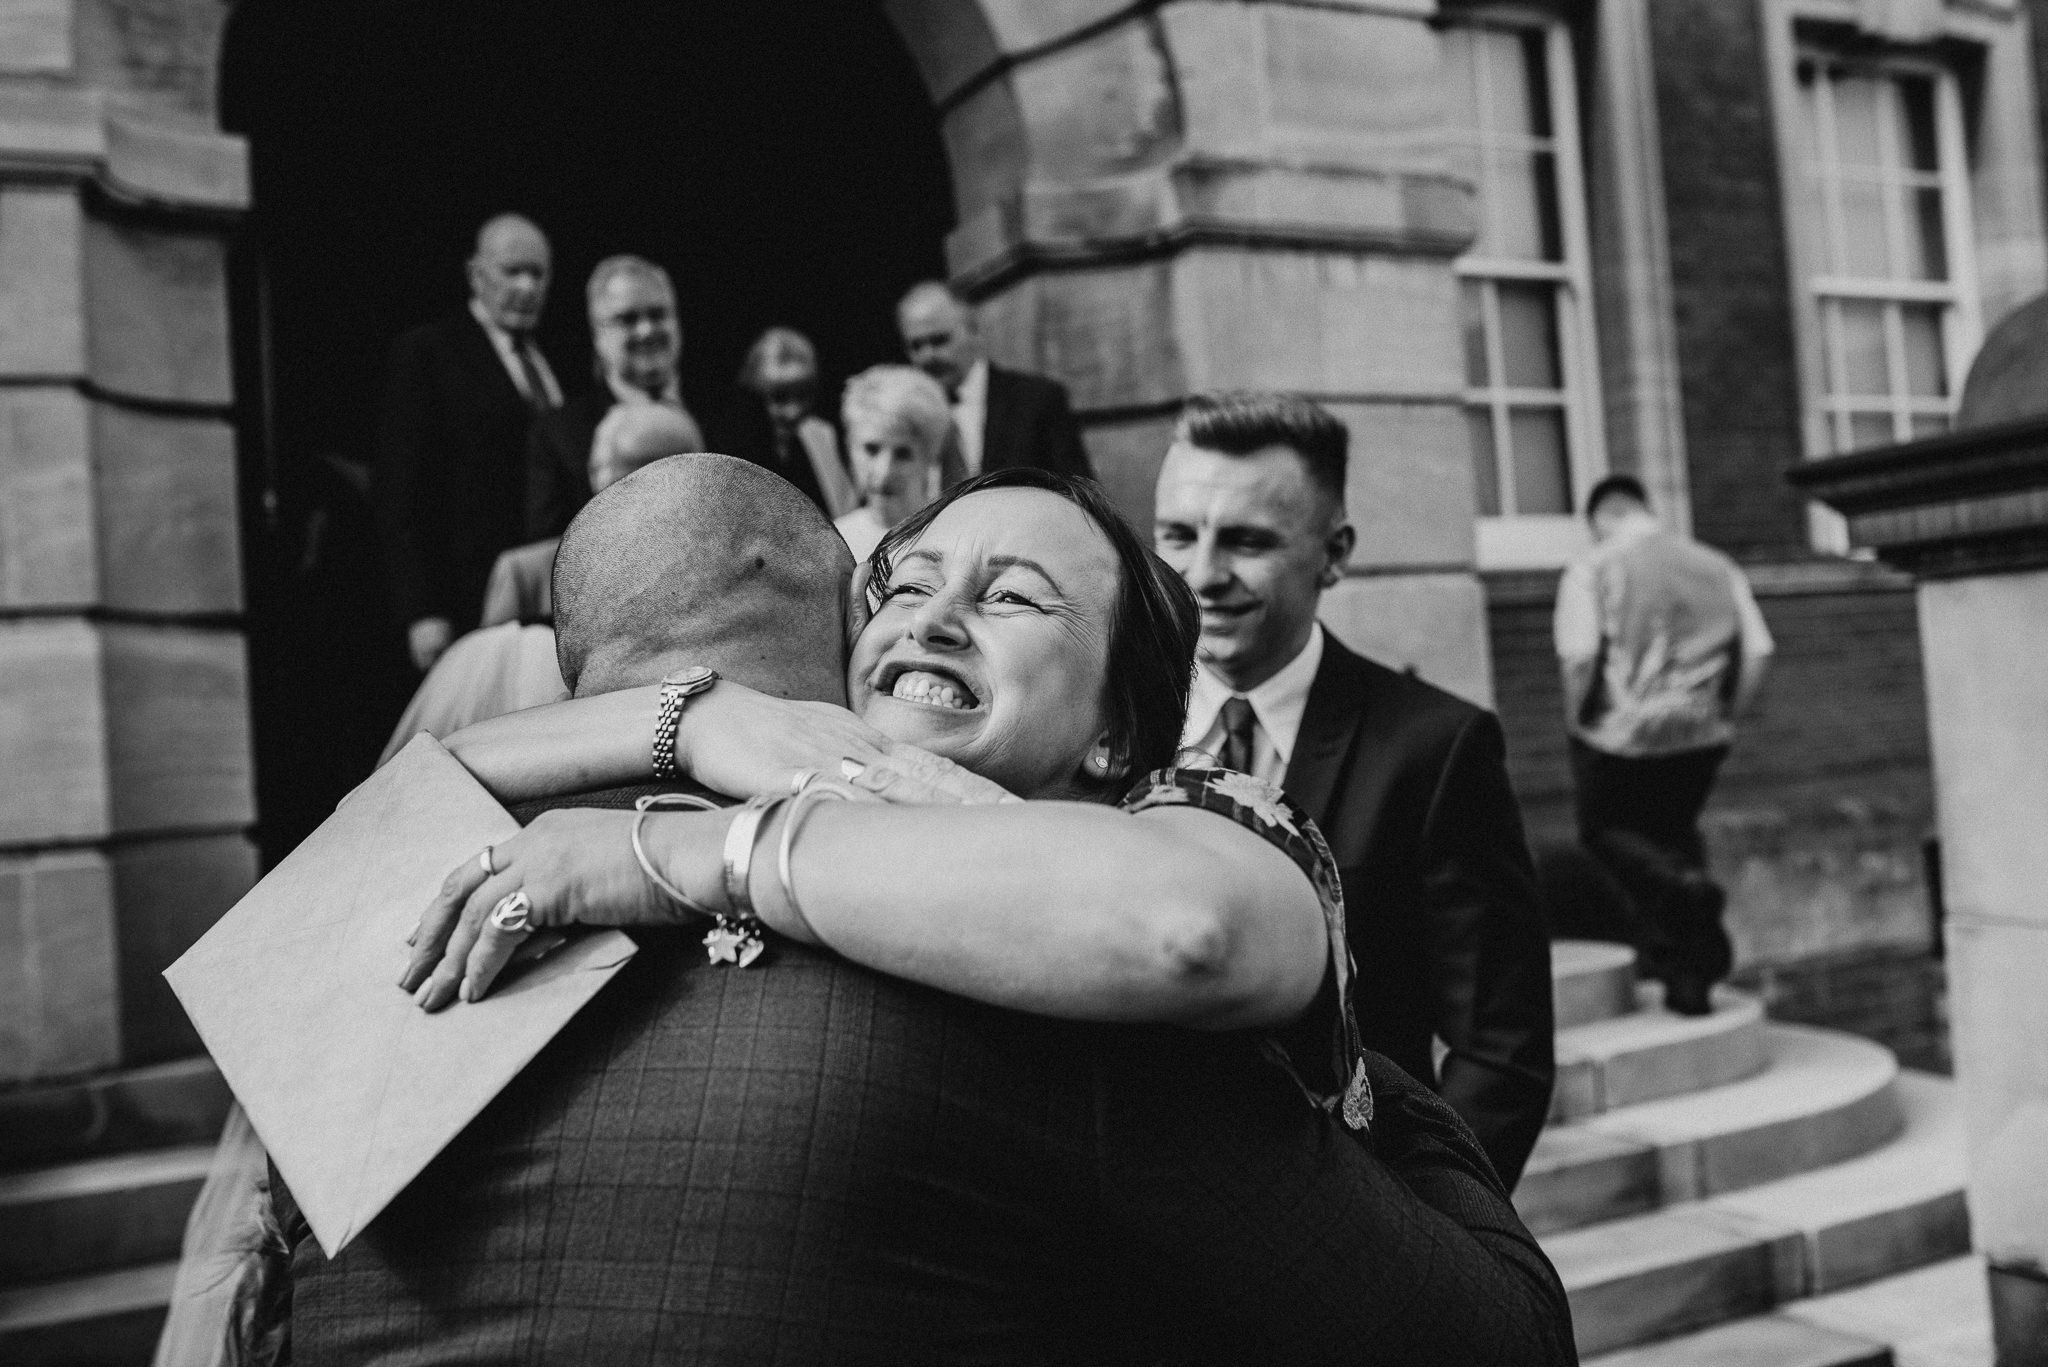 lincolnshire-wedding-photographer-7.jpg